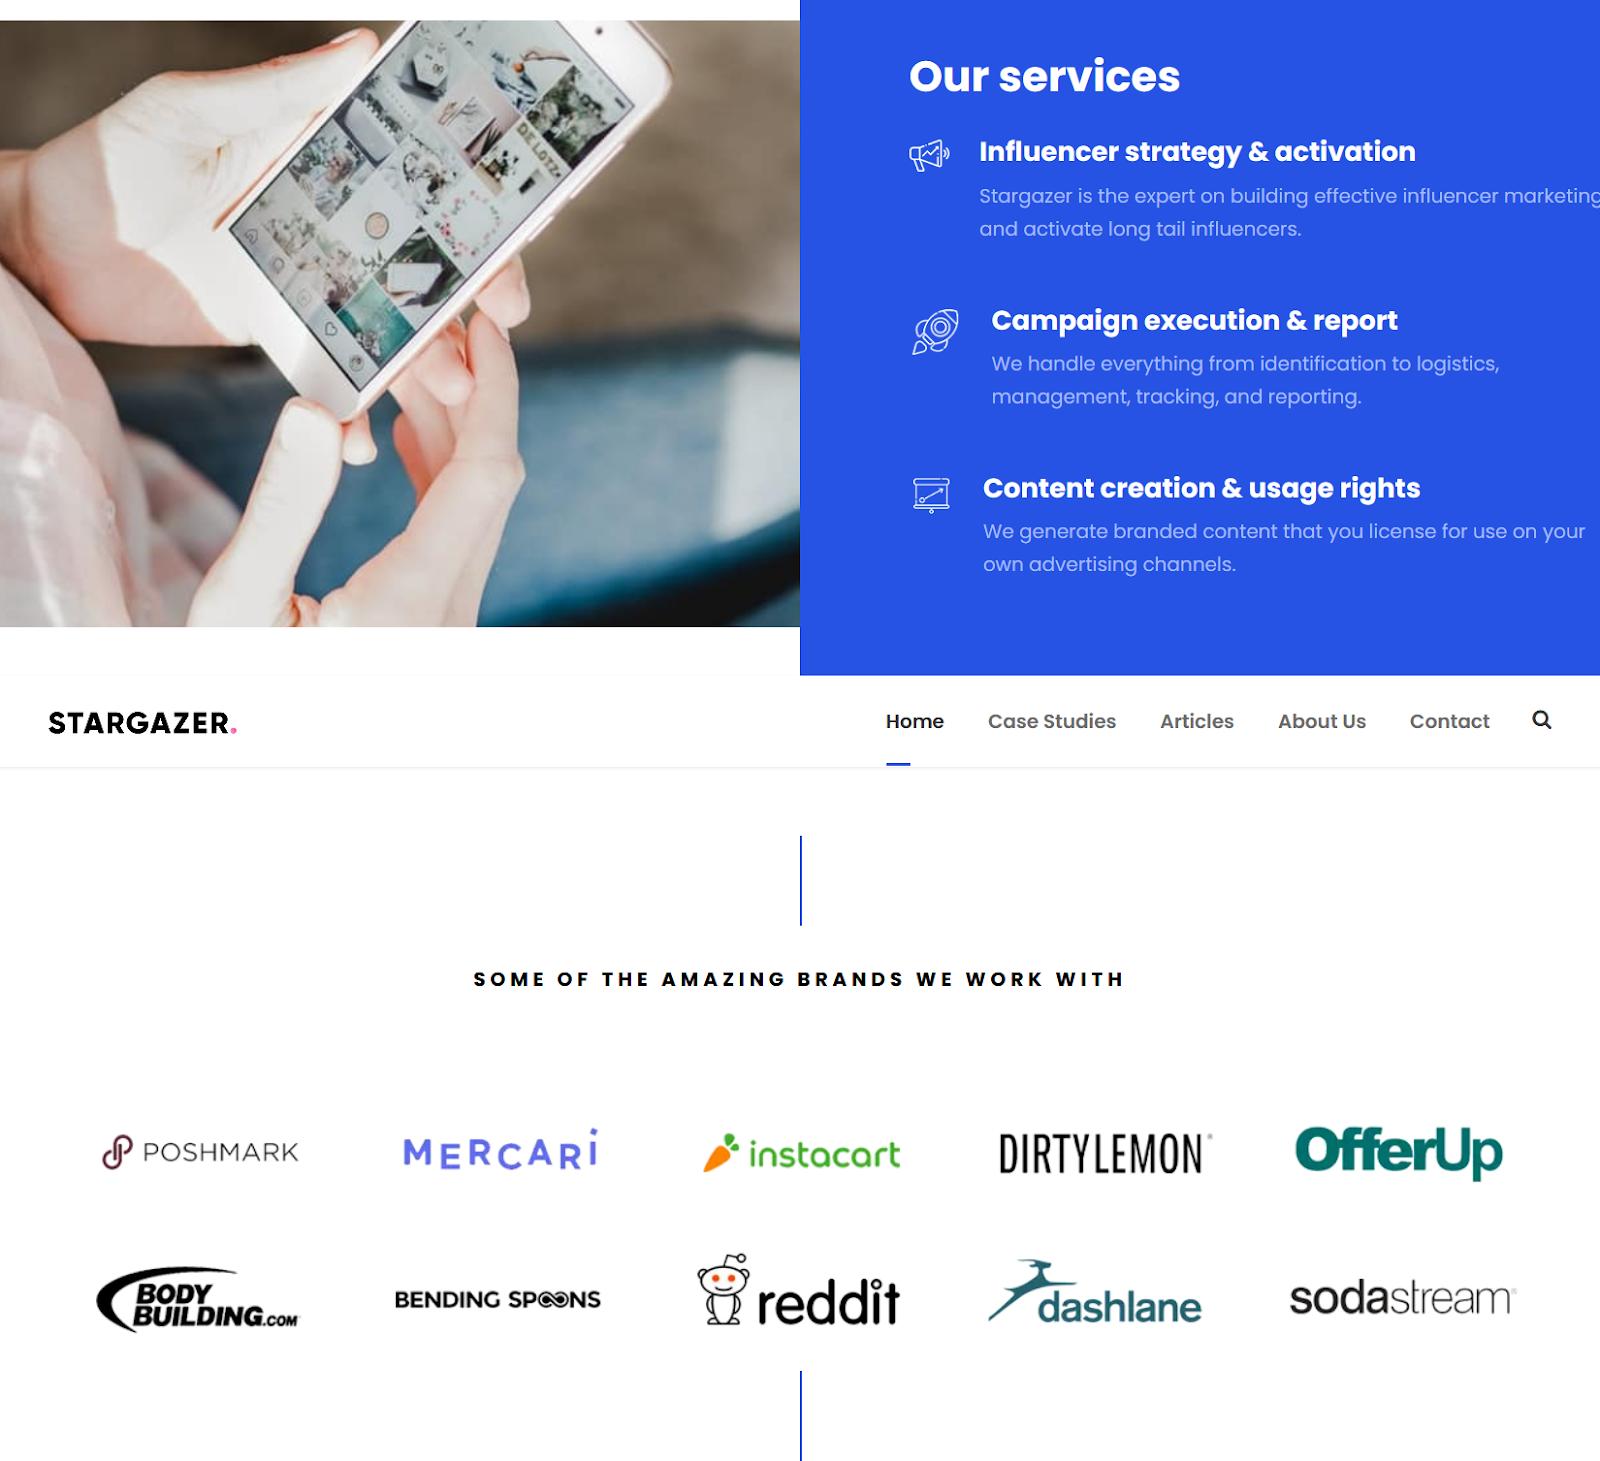 Stargazer. Top influencer marketing agency 2021